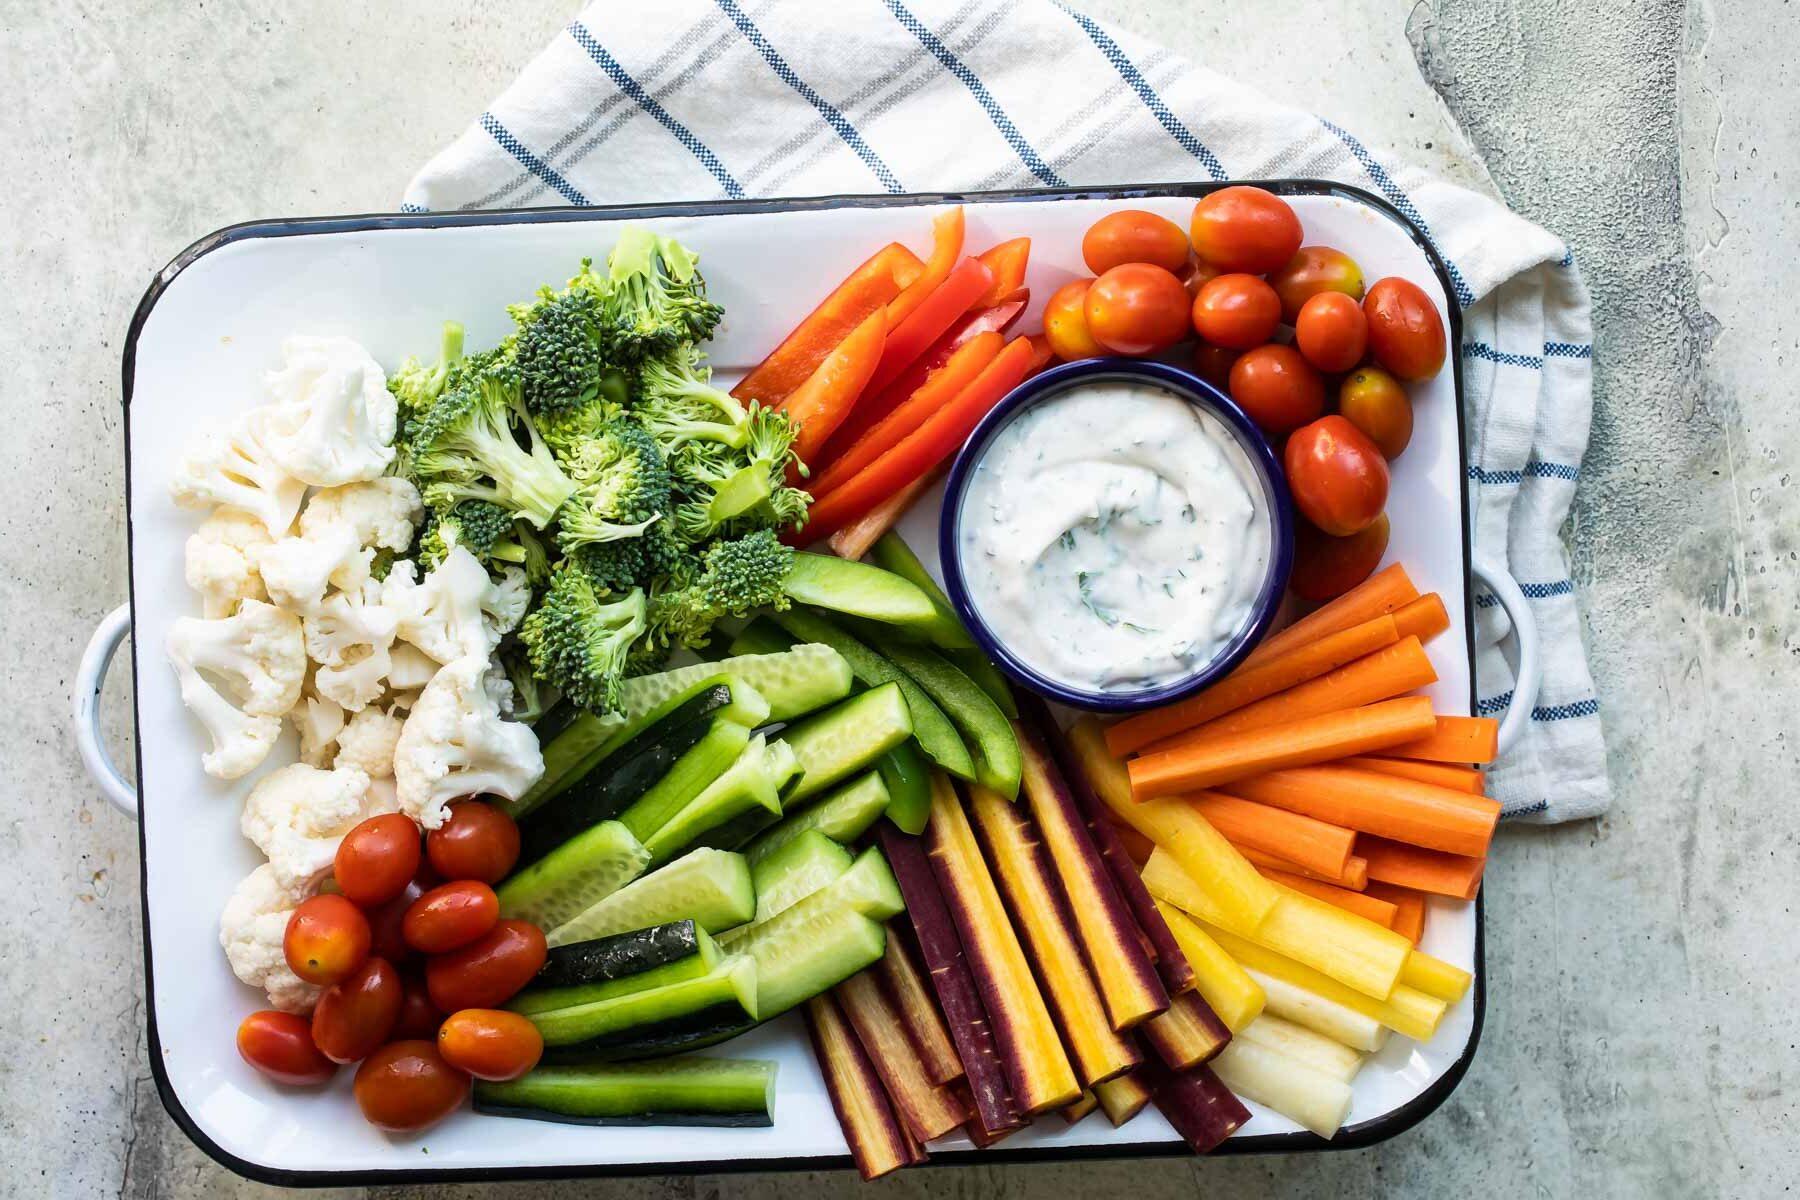 Veggies and veggie dip on a white rectangular platter.